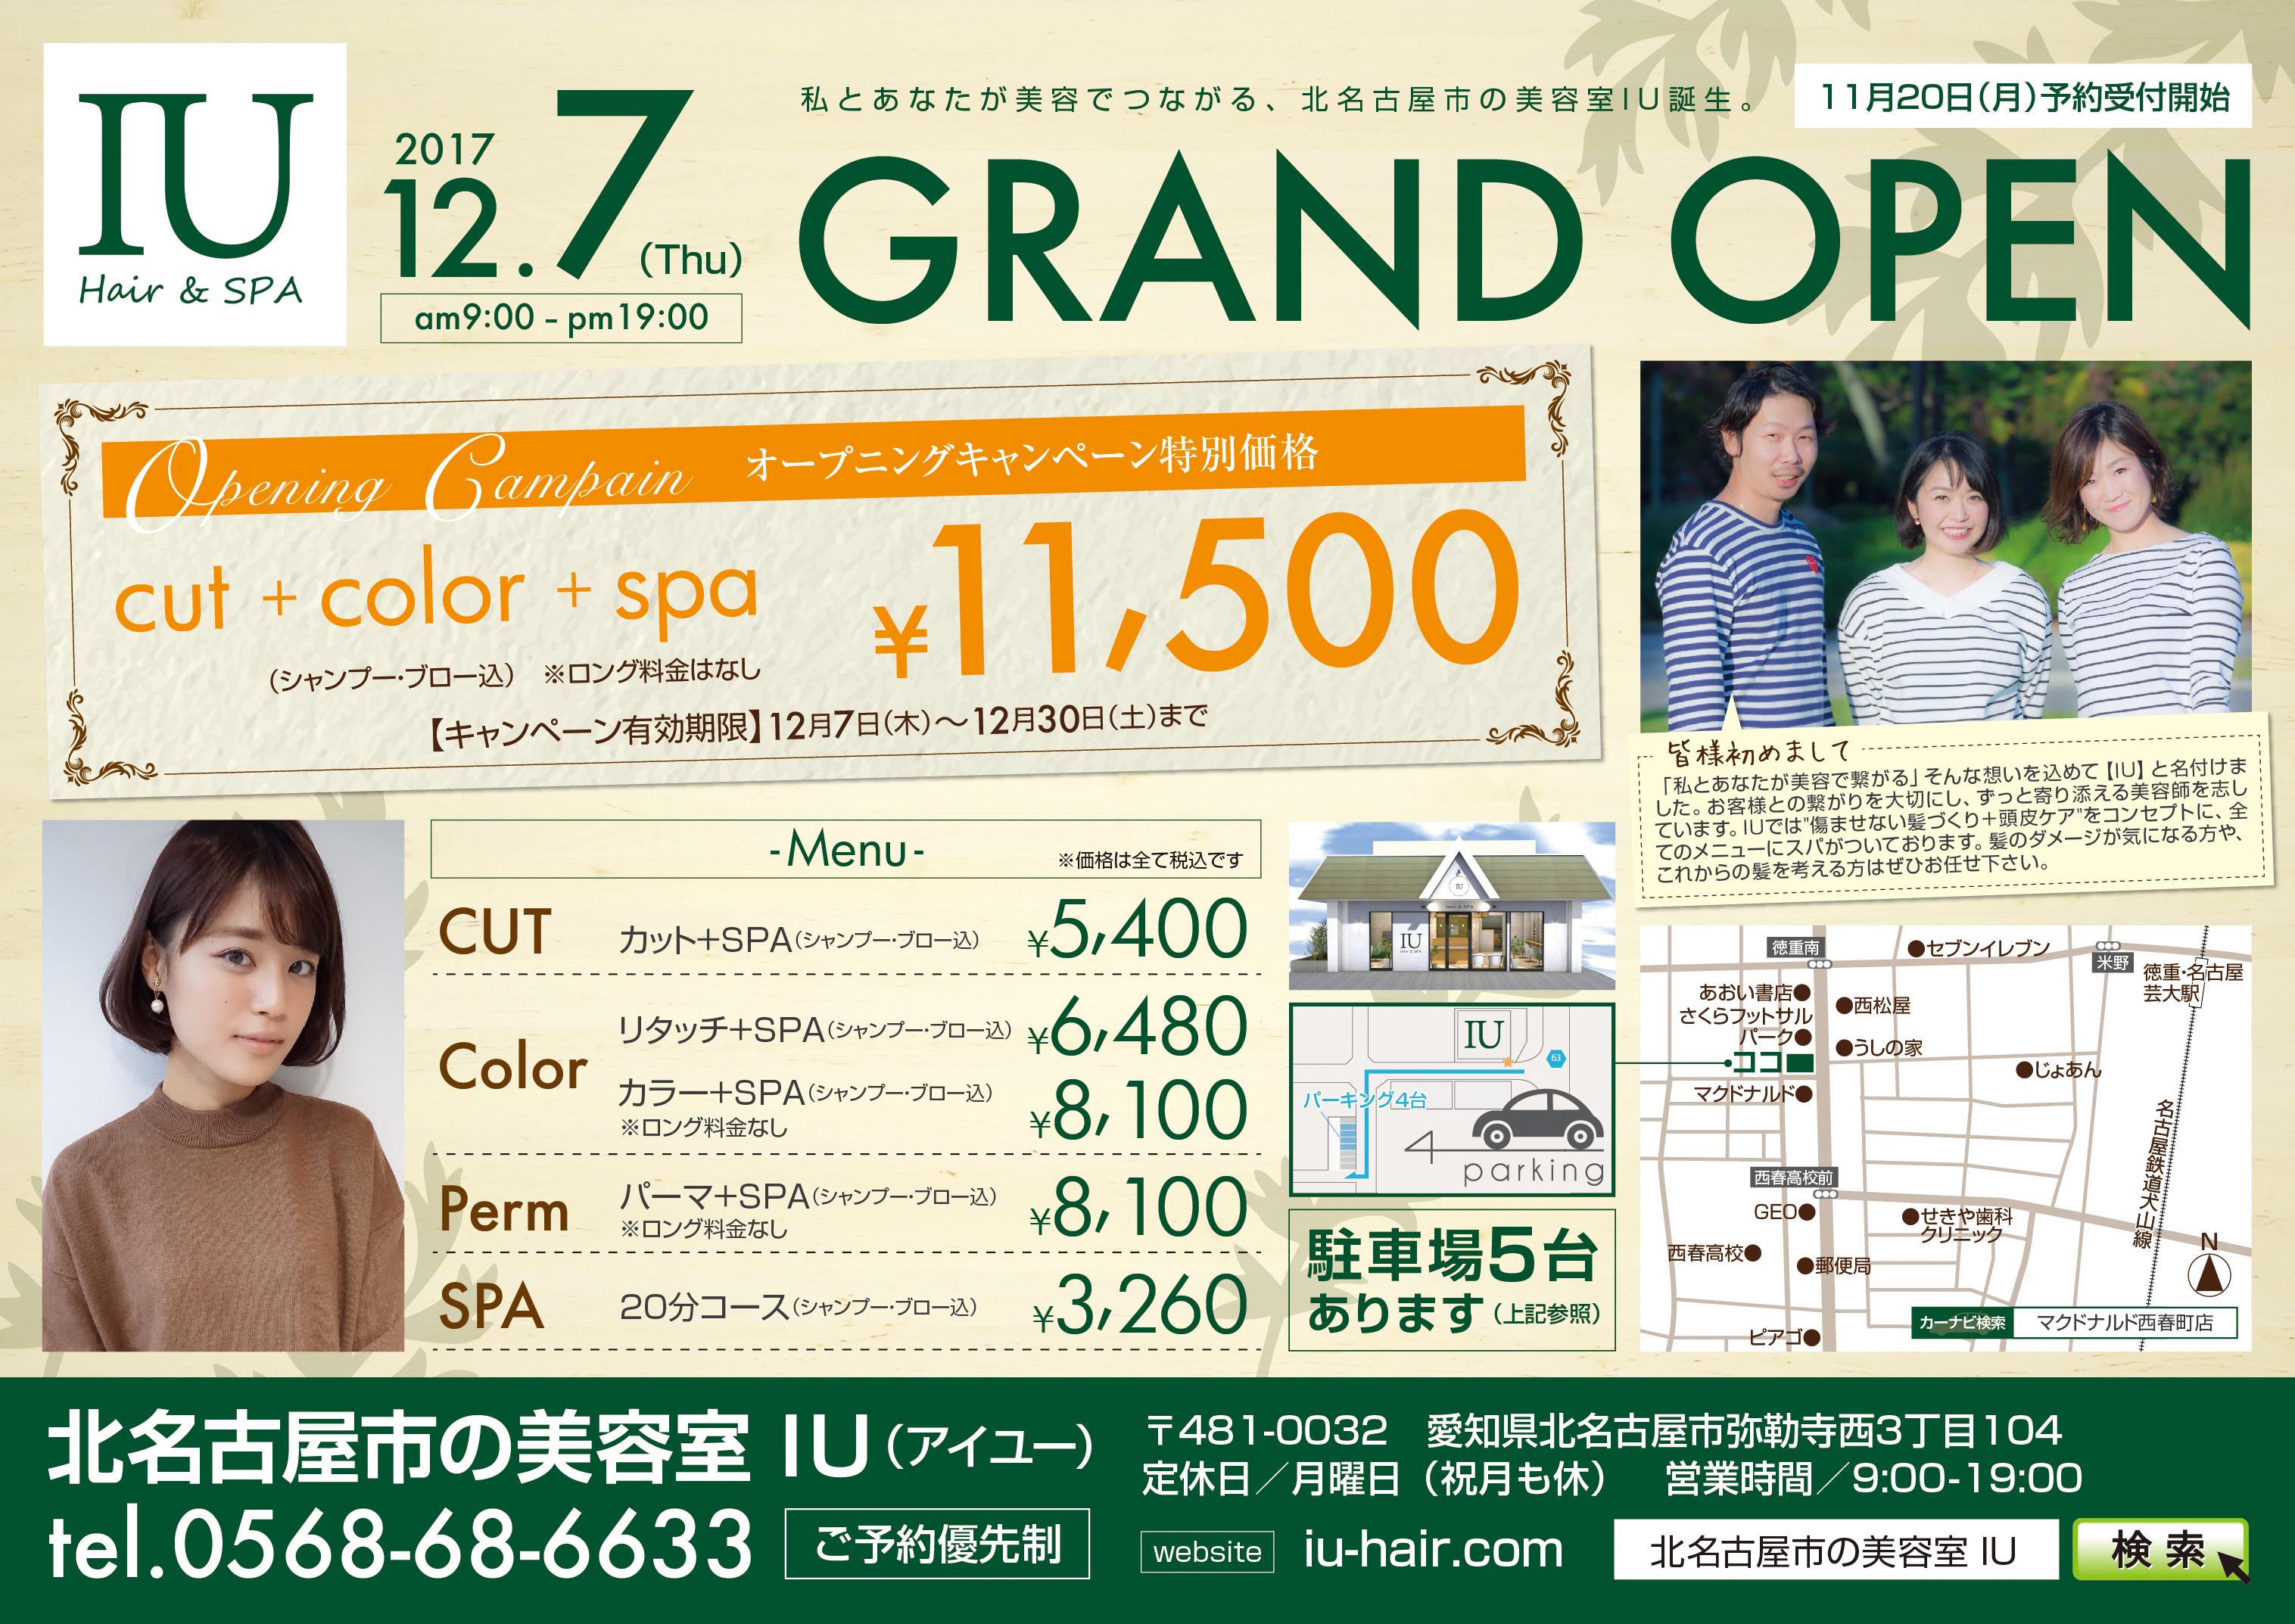 美容室IU【B5 Flyer】